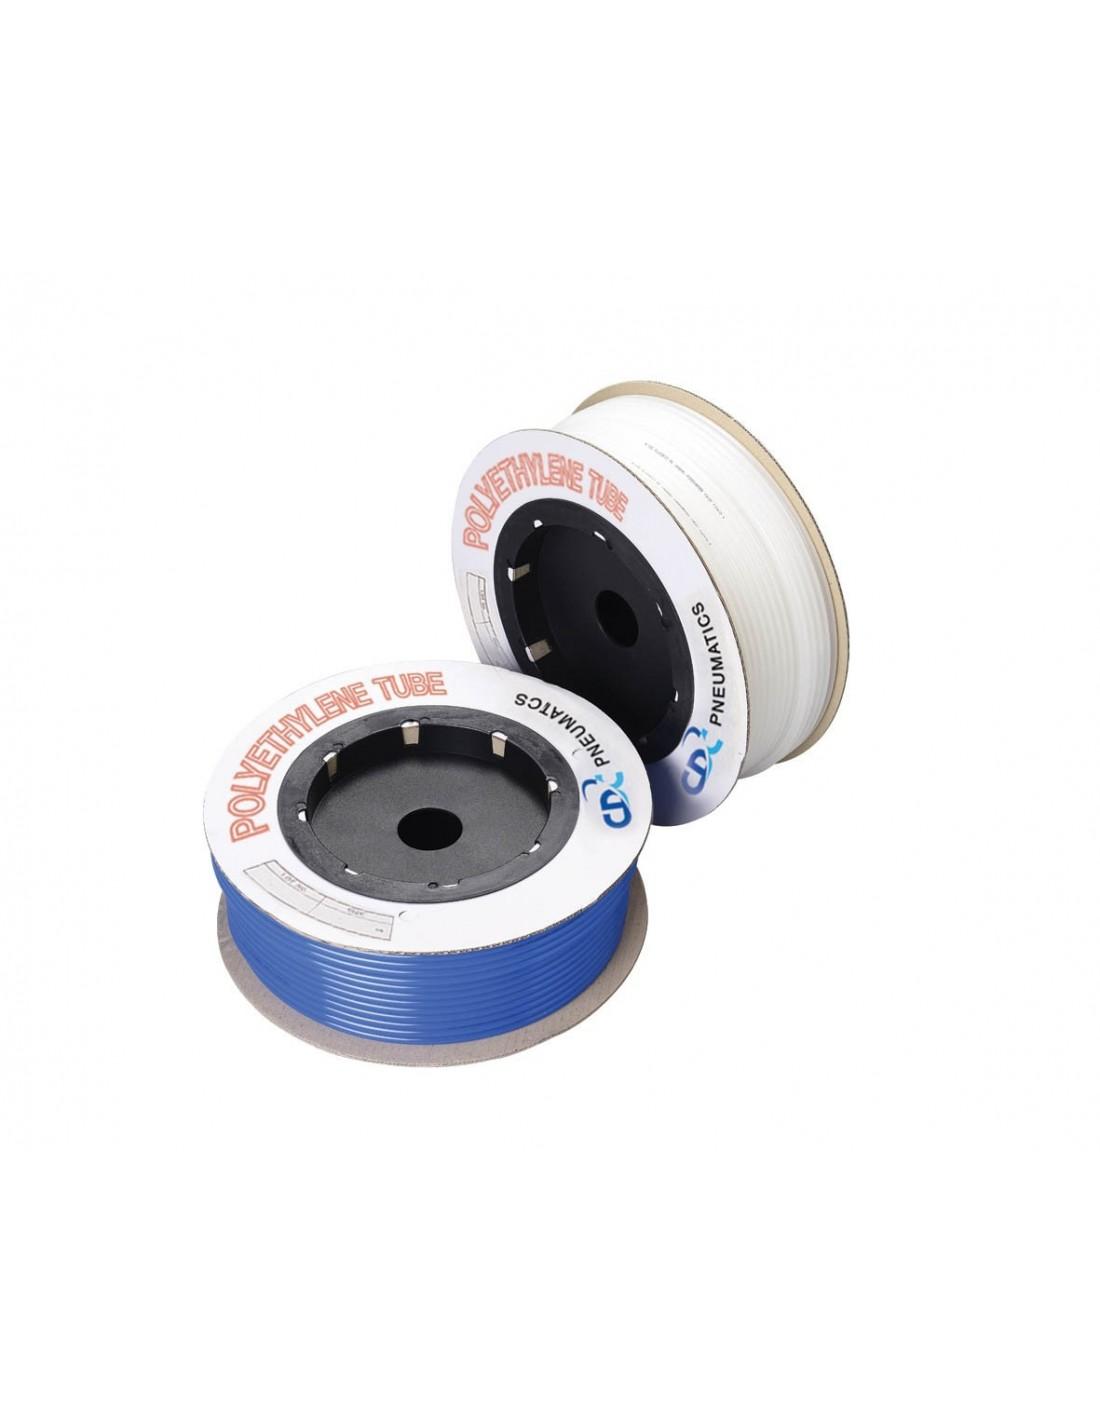 PE-I - Pushfit hose (inch)